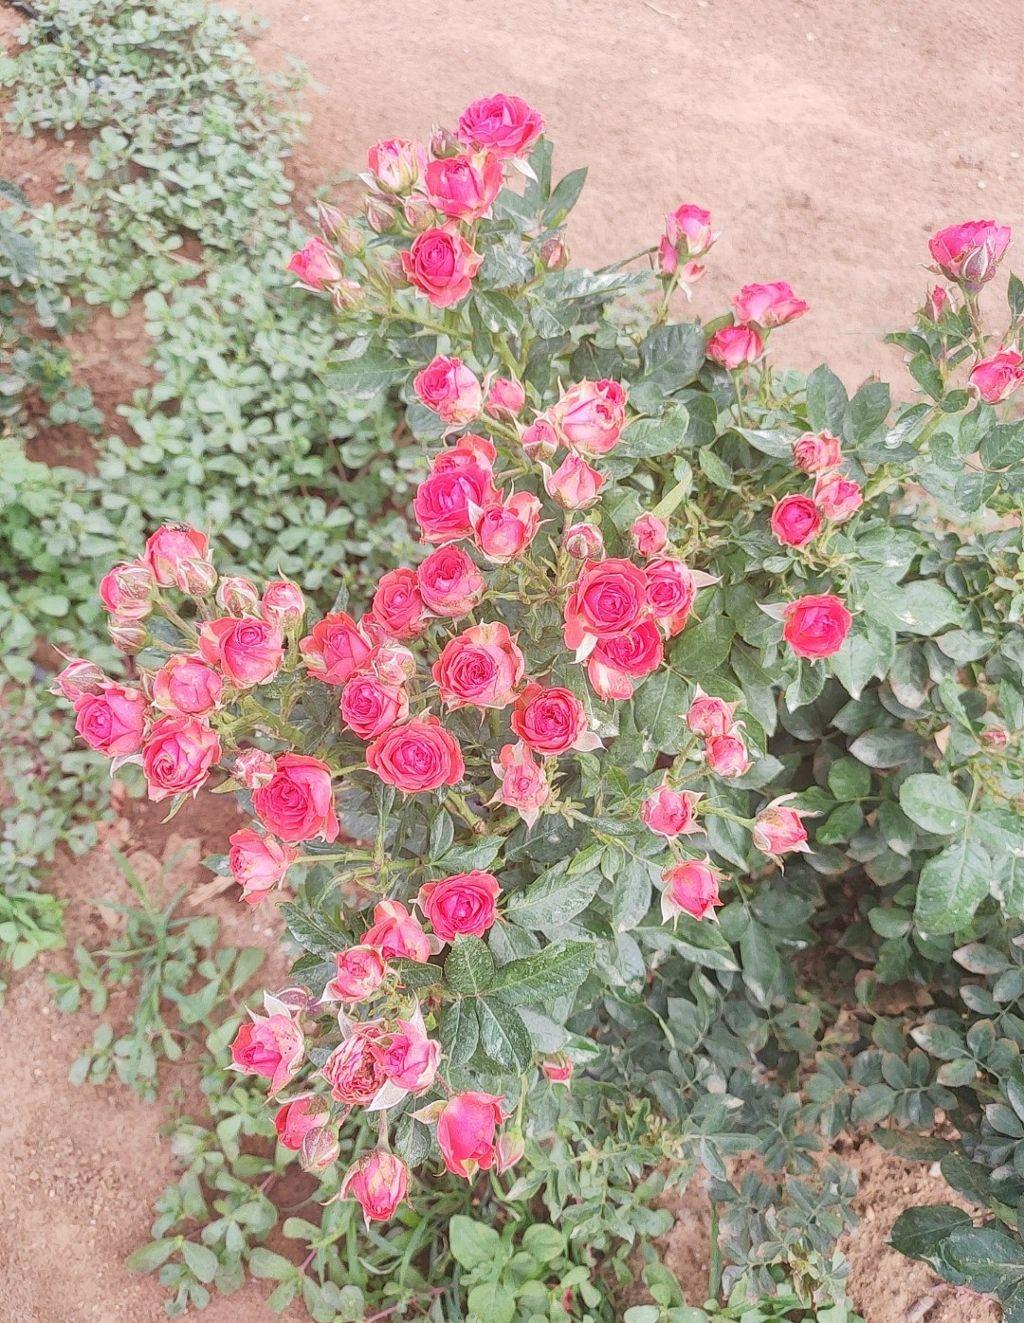 #rose #red #love